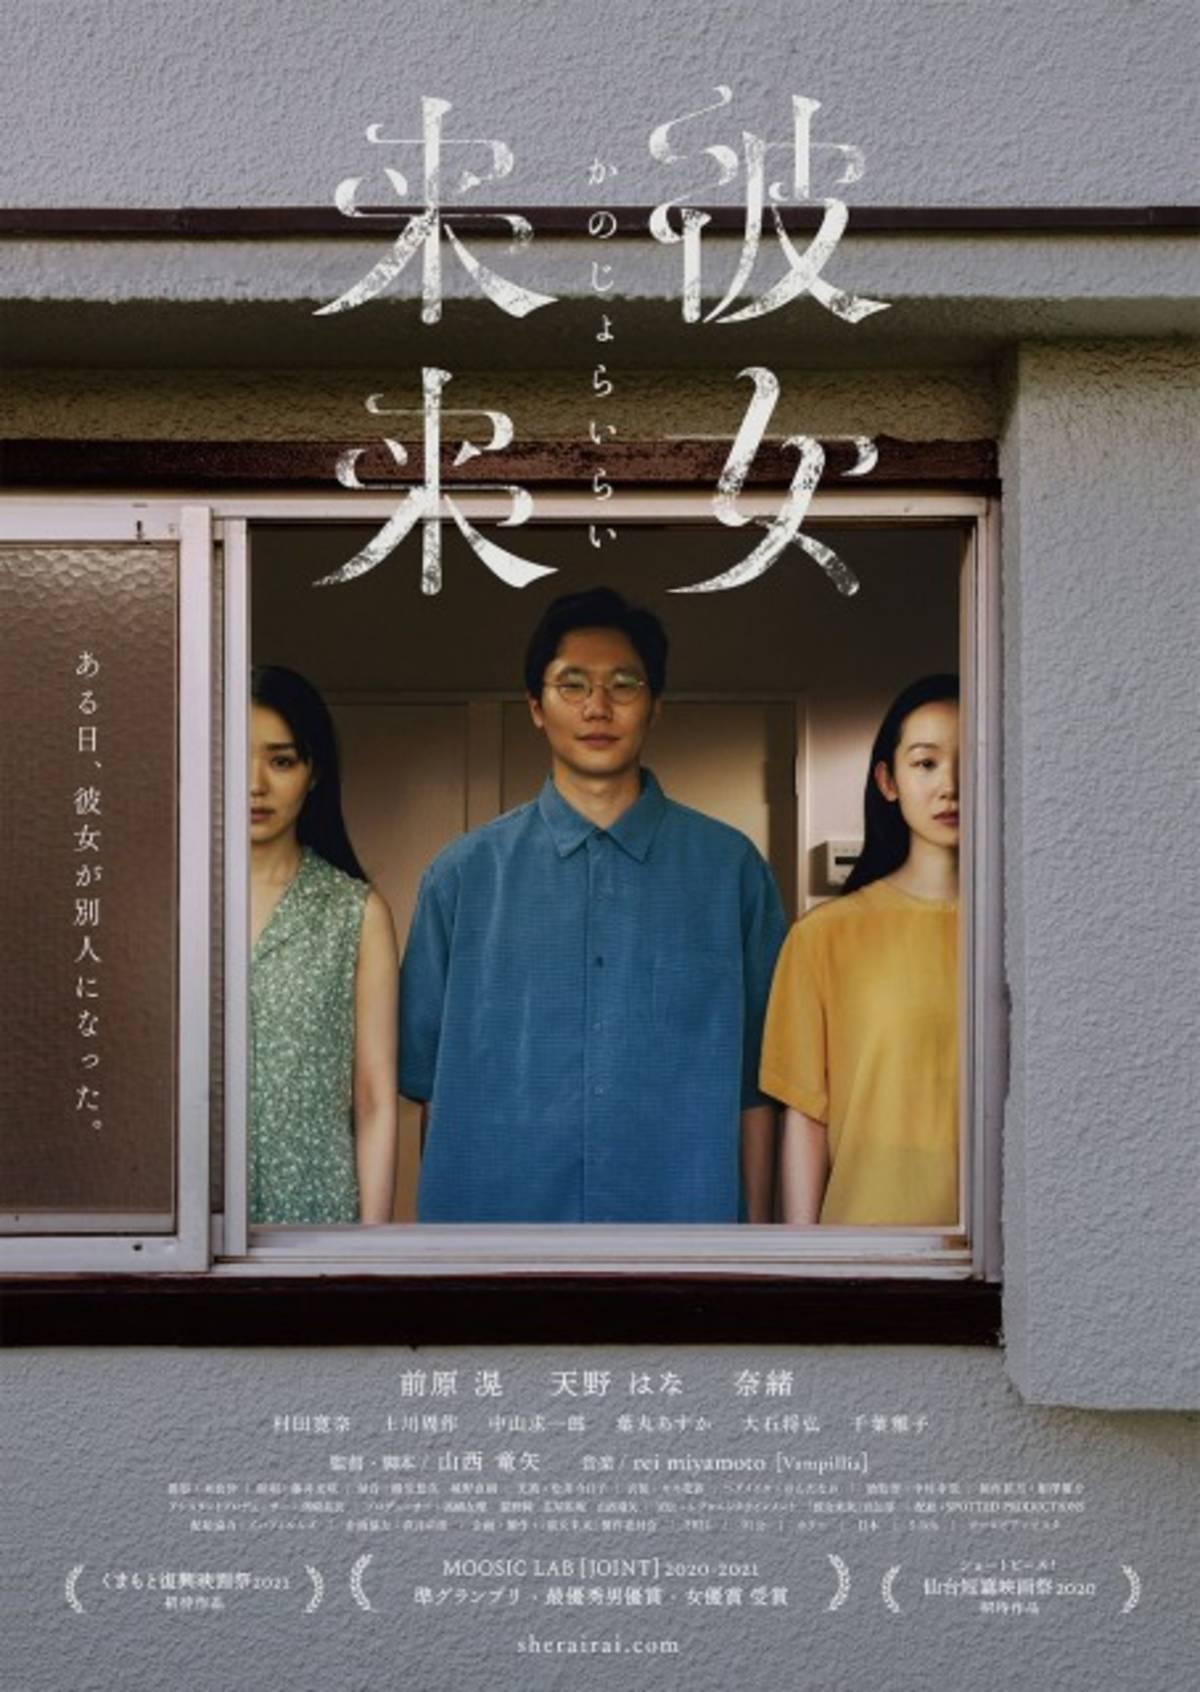 Kanojo Rairai film - Tatsuya Yamanishi - poster